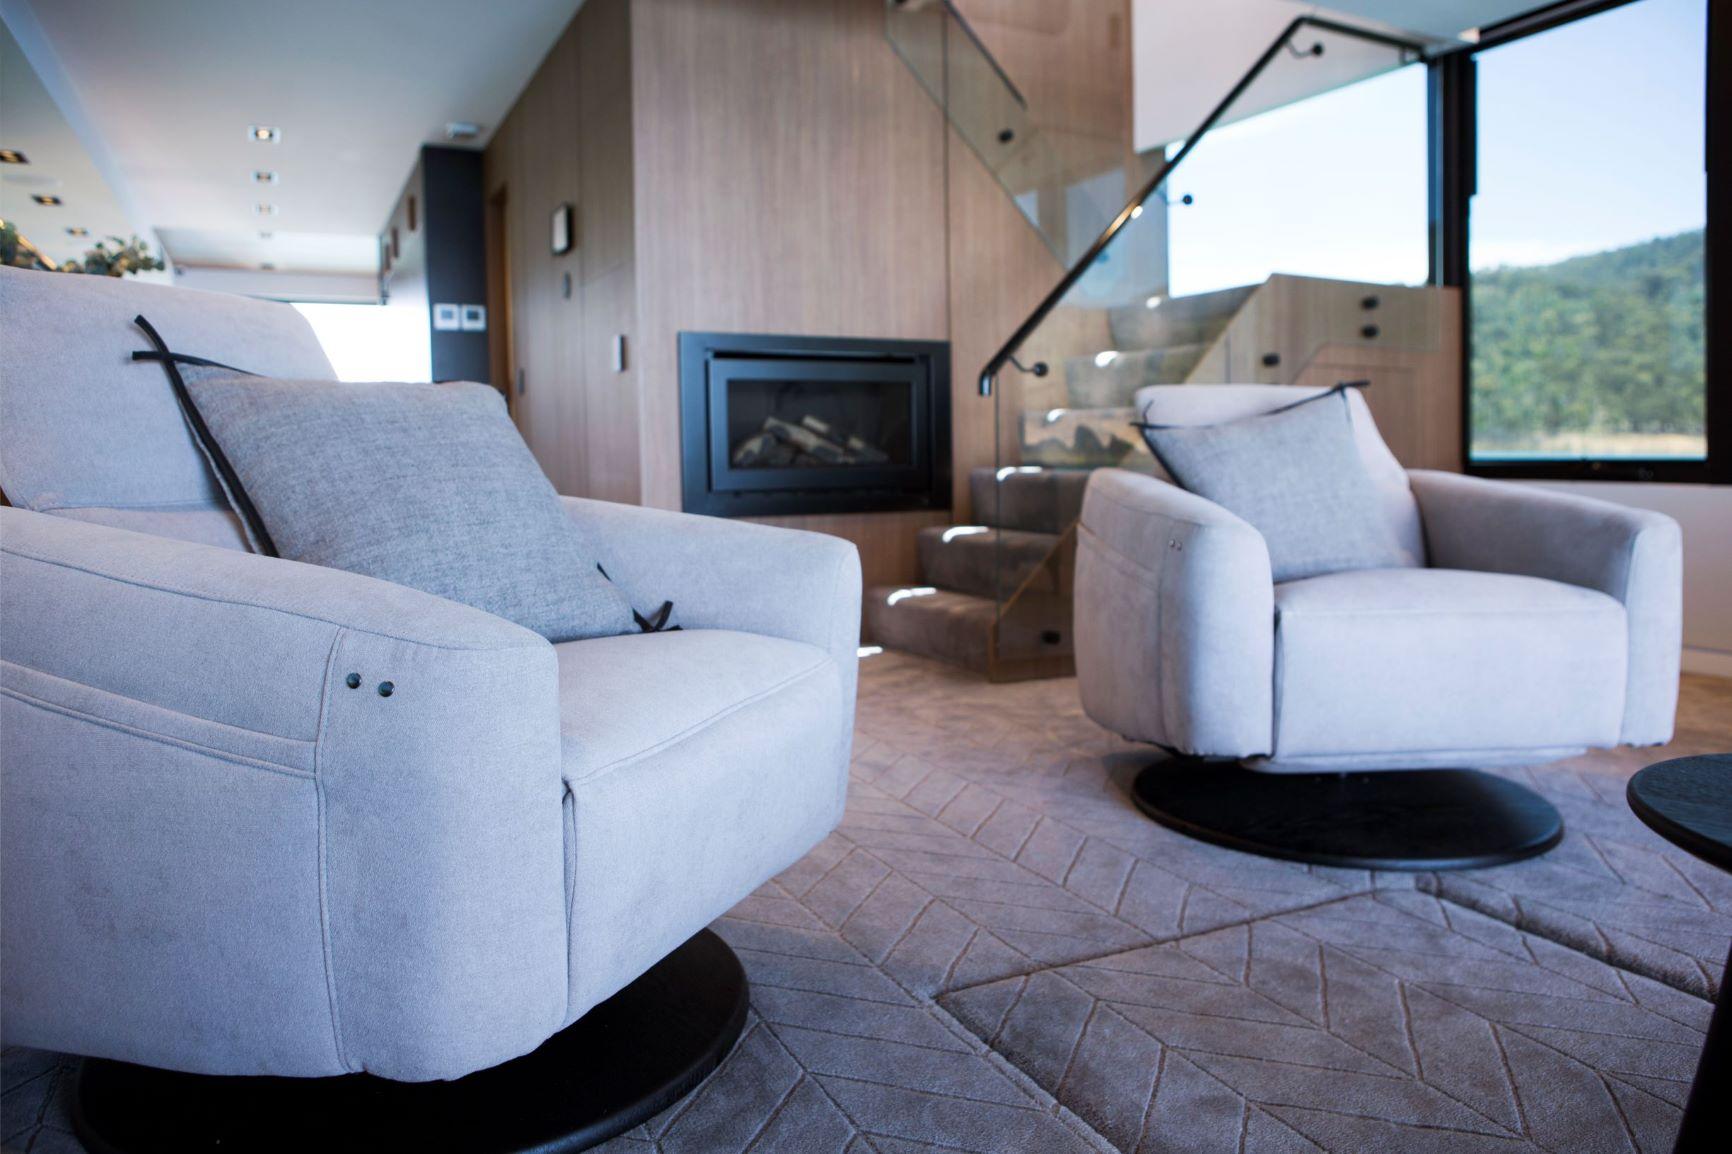 houseboat Interior design